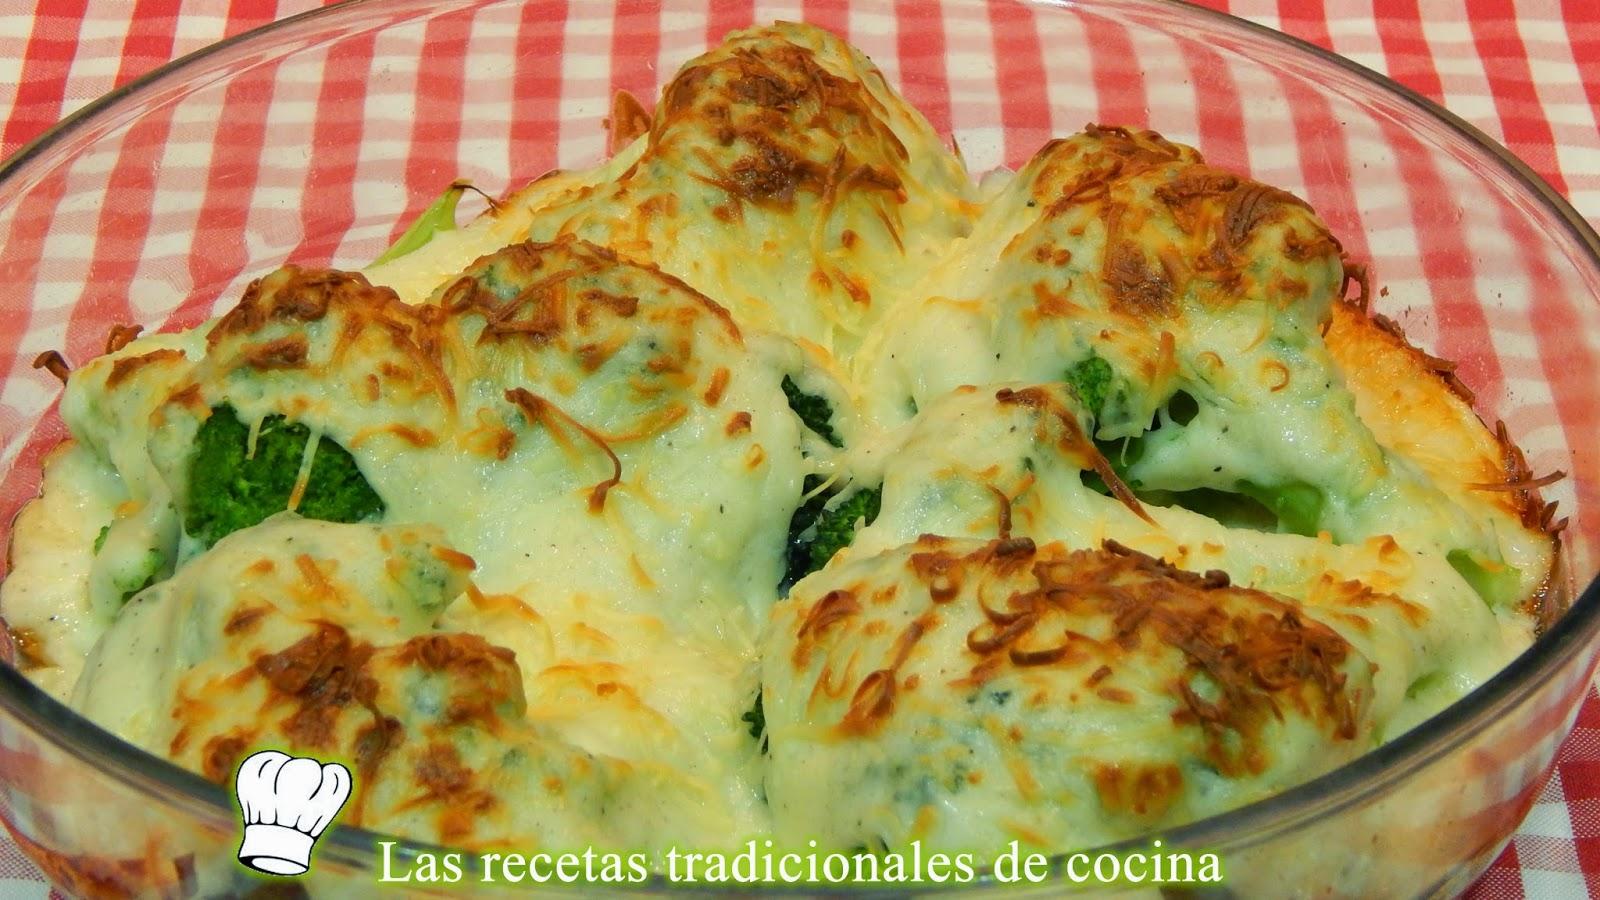 Brócoli gratinado con bechamel